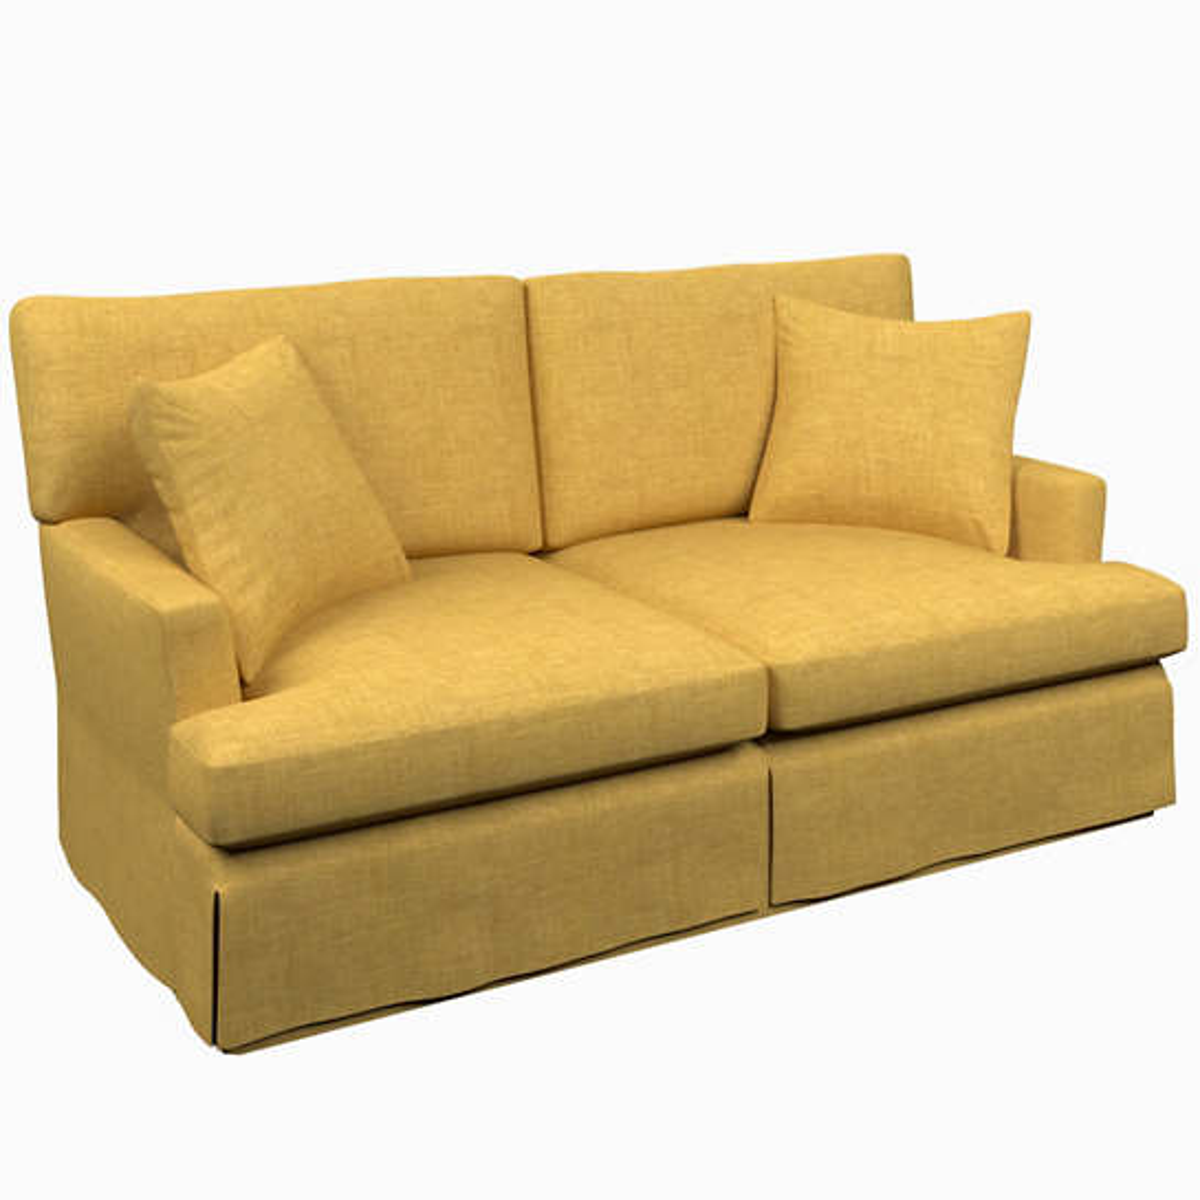 Greylock Gold Saybrook 2 Seater Upholstered Sofa